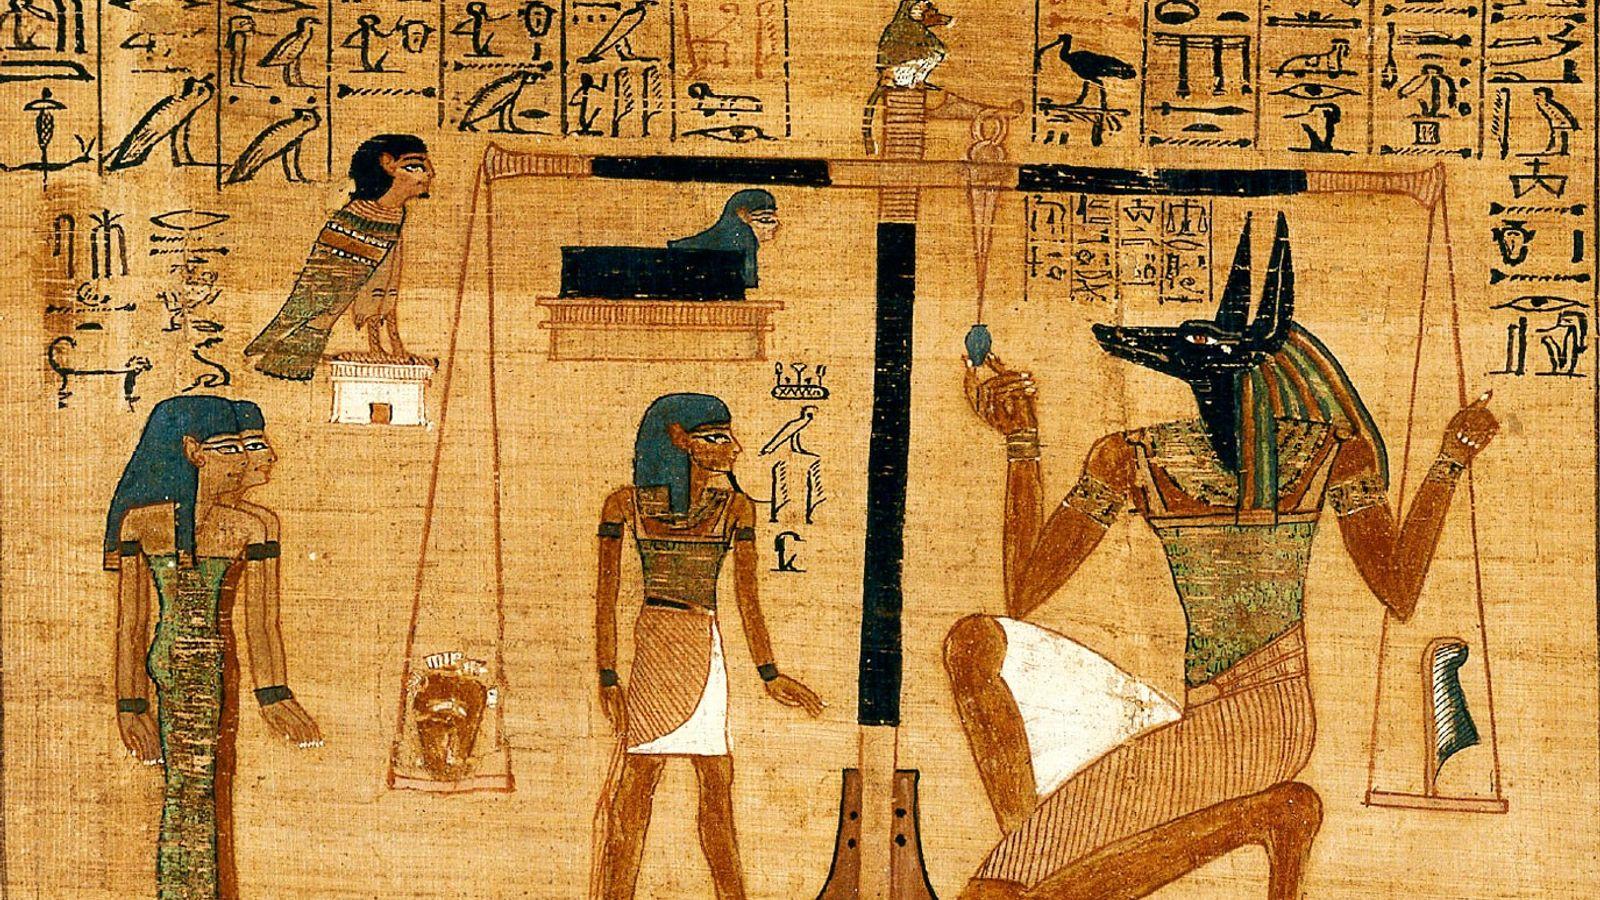 02-ani-papyrus-anubis-bm07404g